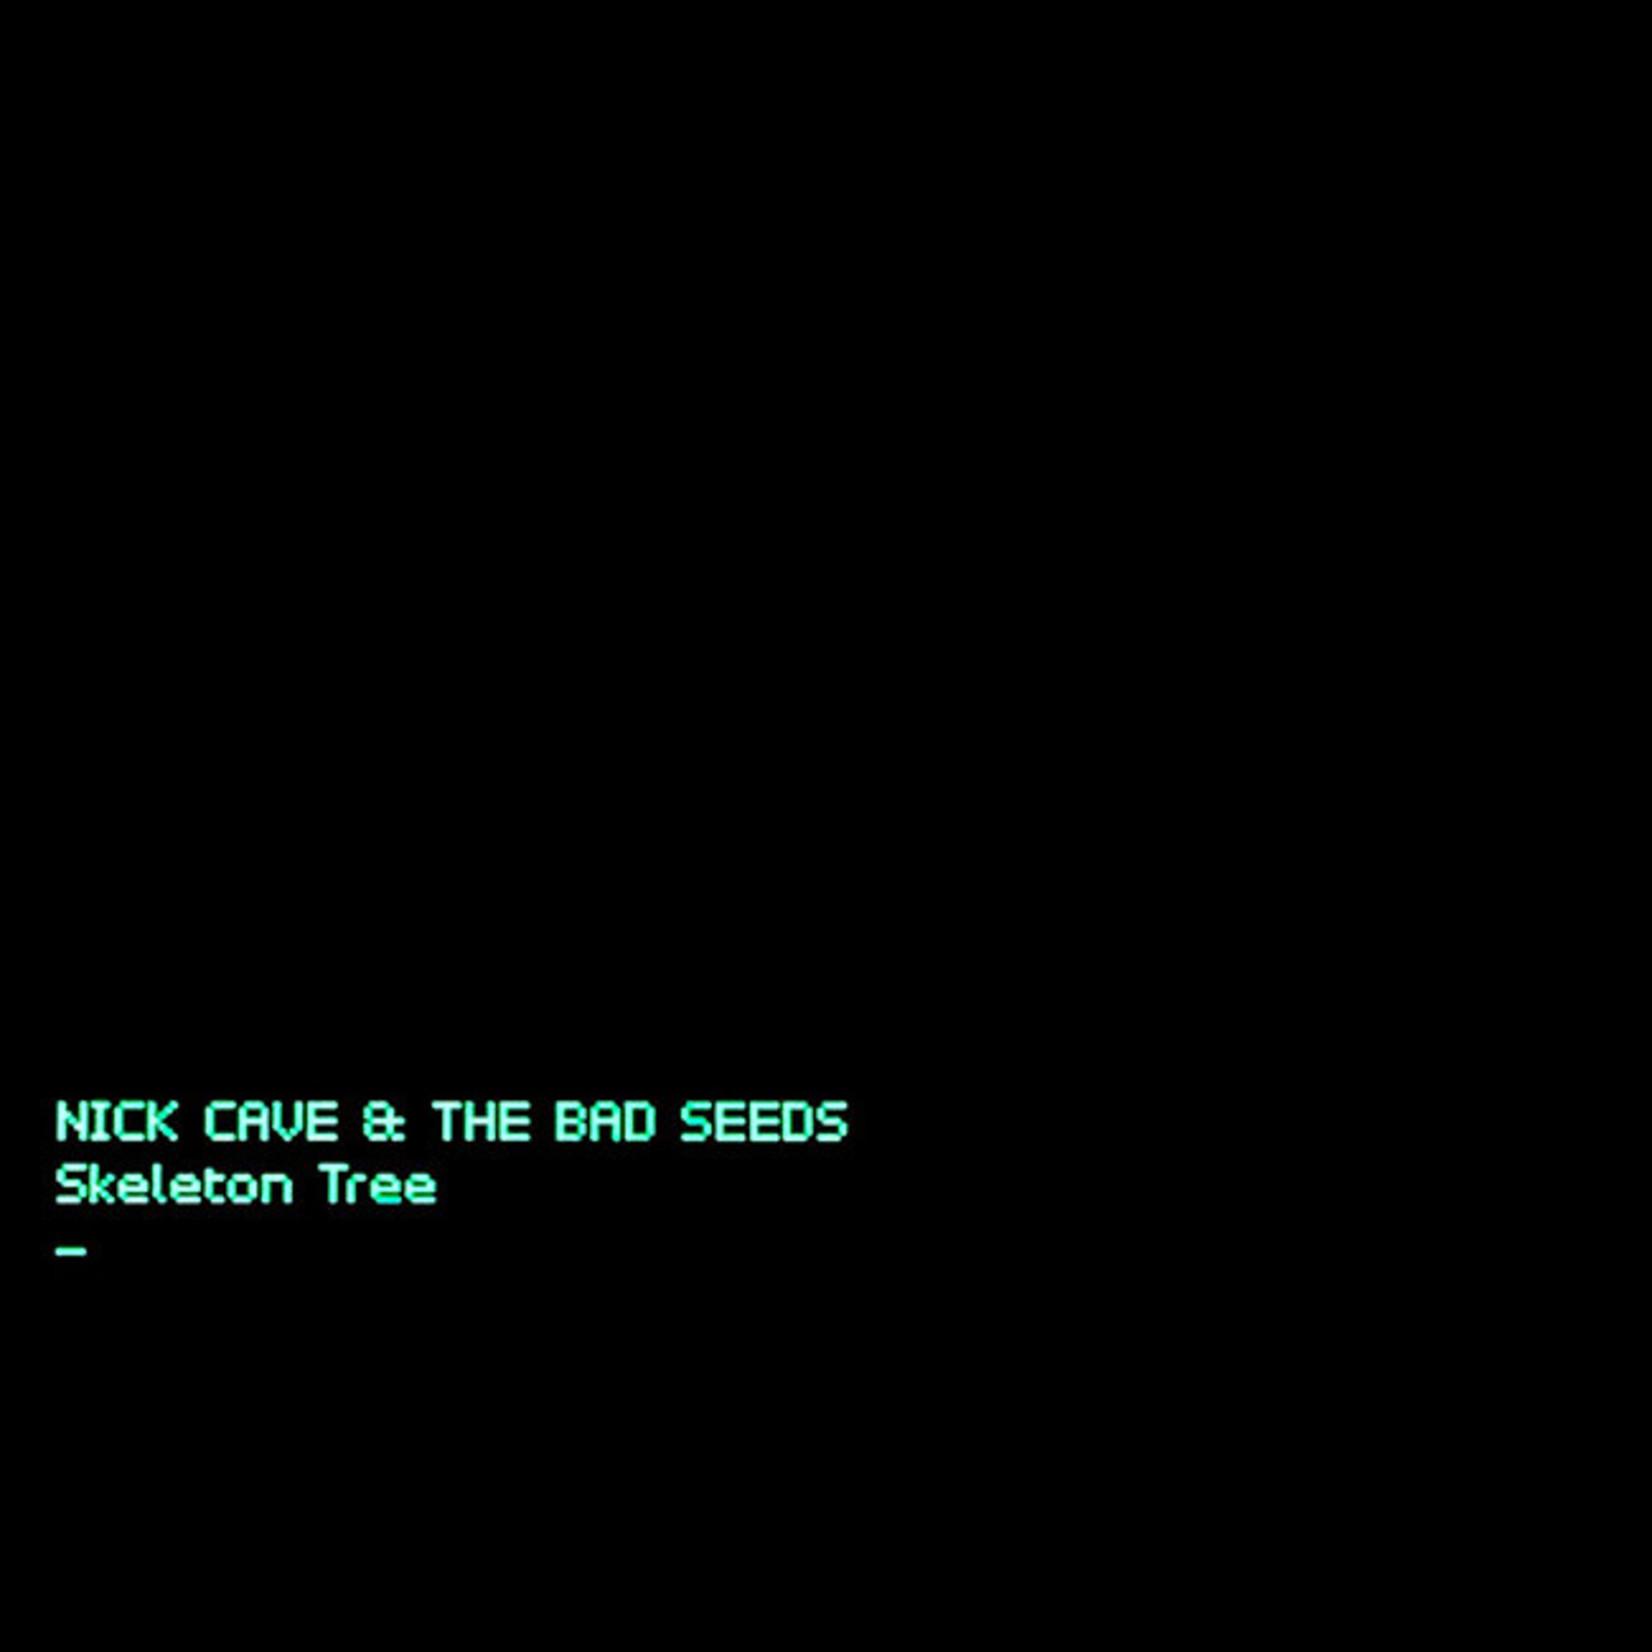 [New] Cave, Nick & the Bad Seeds: Skeleton Tree